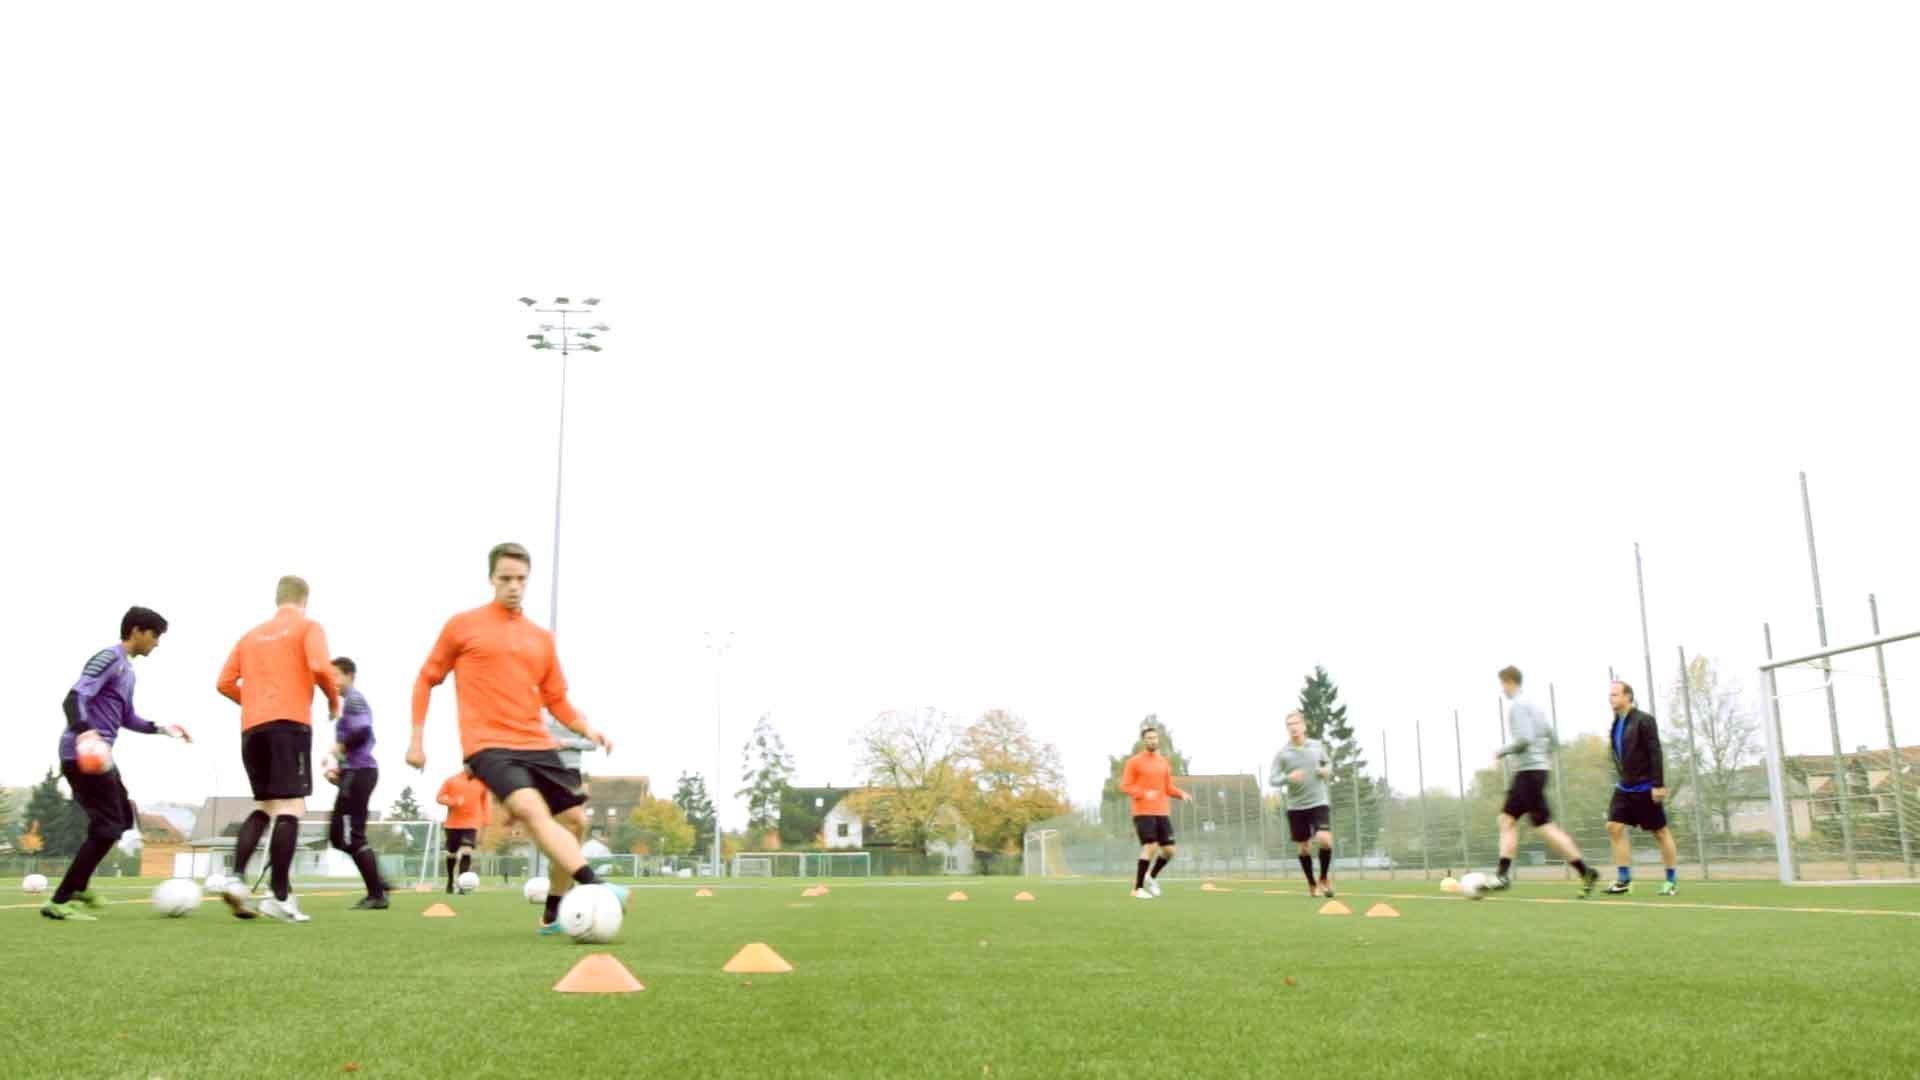 Fußballübung: Passparcours